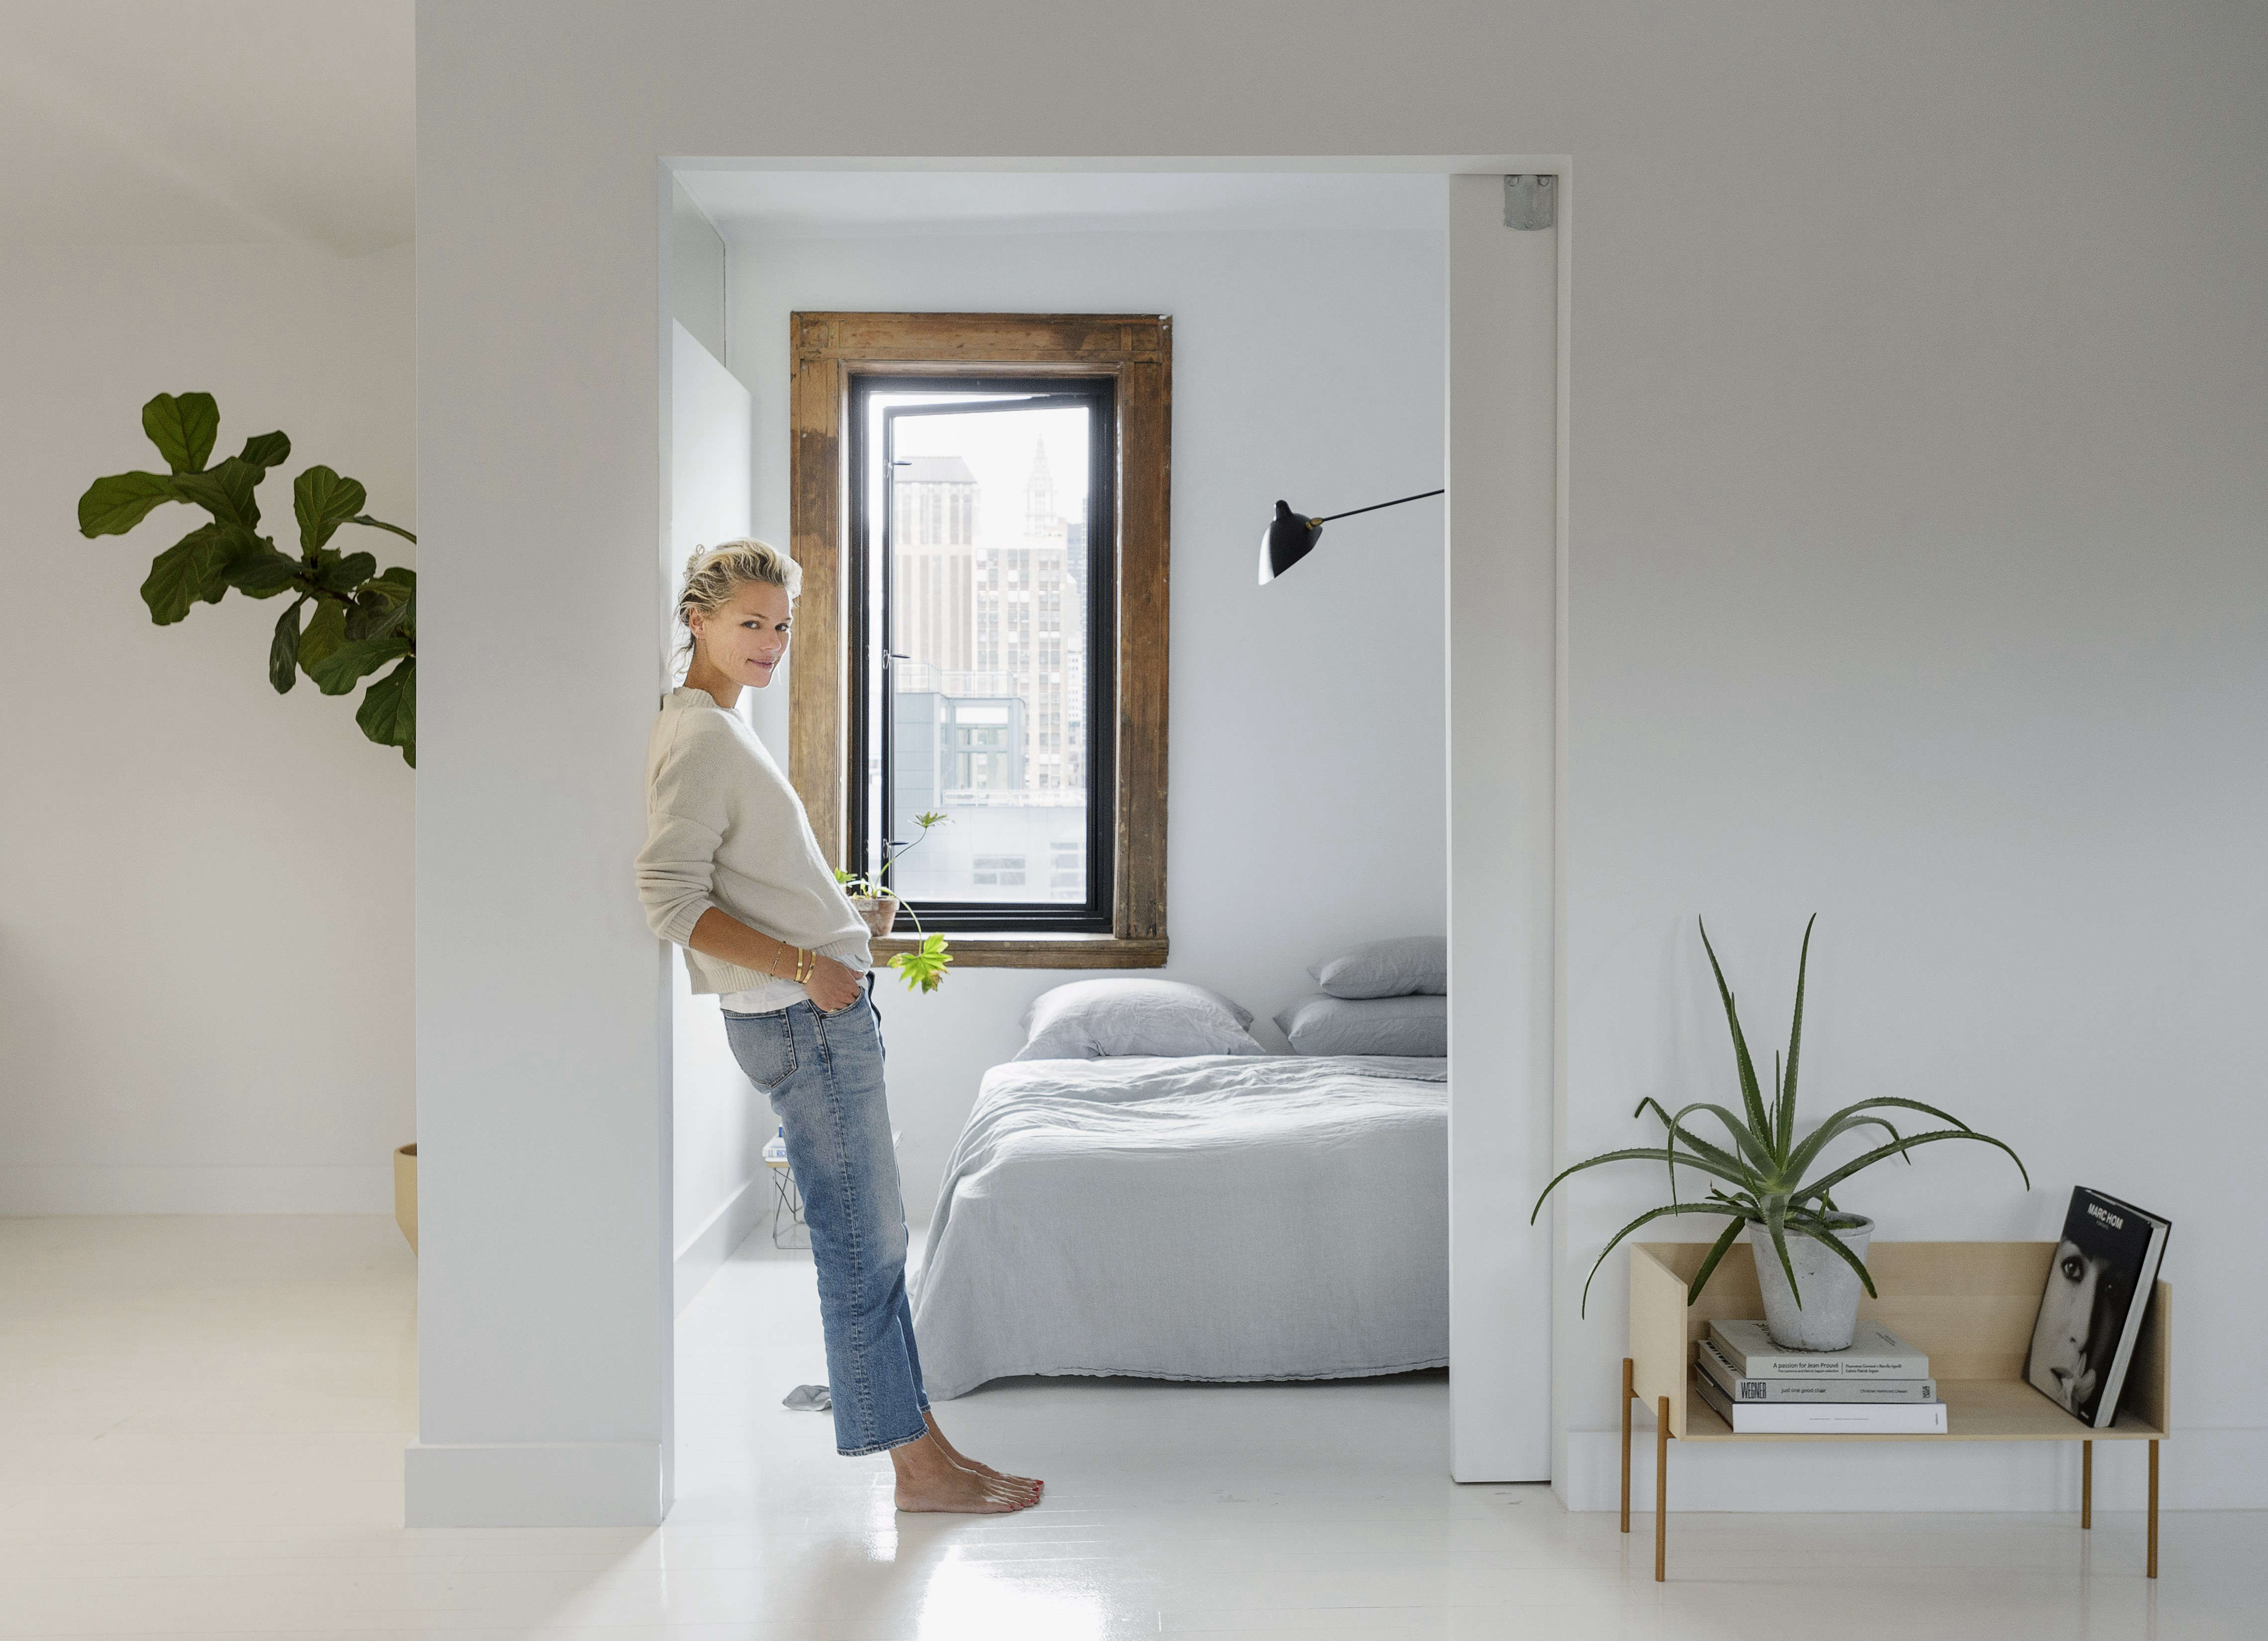 Superb Model Camilla Vestu0027s NYC Loft And Scandi Design Business Objects By Camilla  Vest